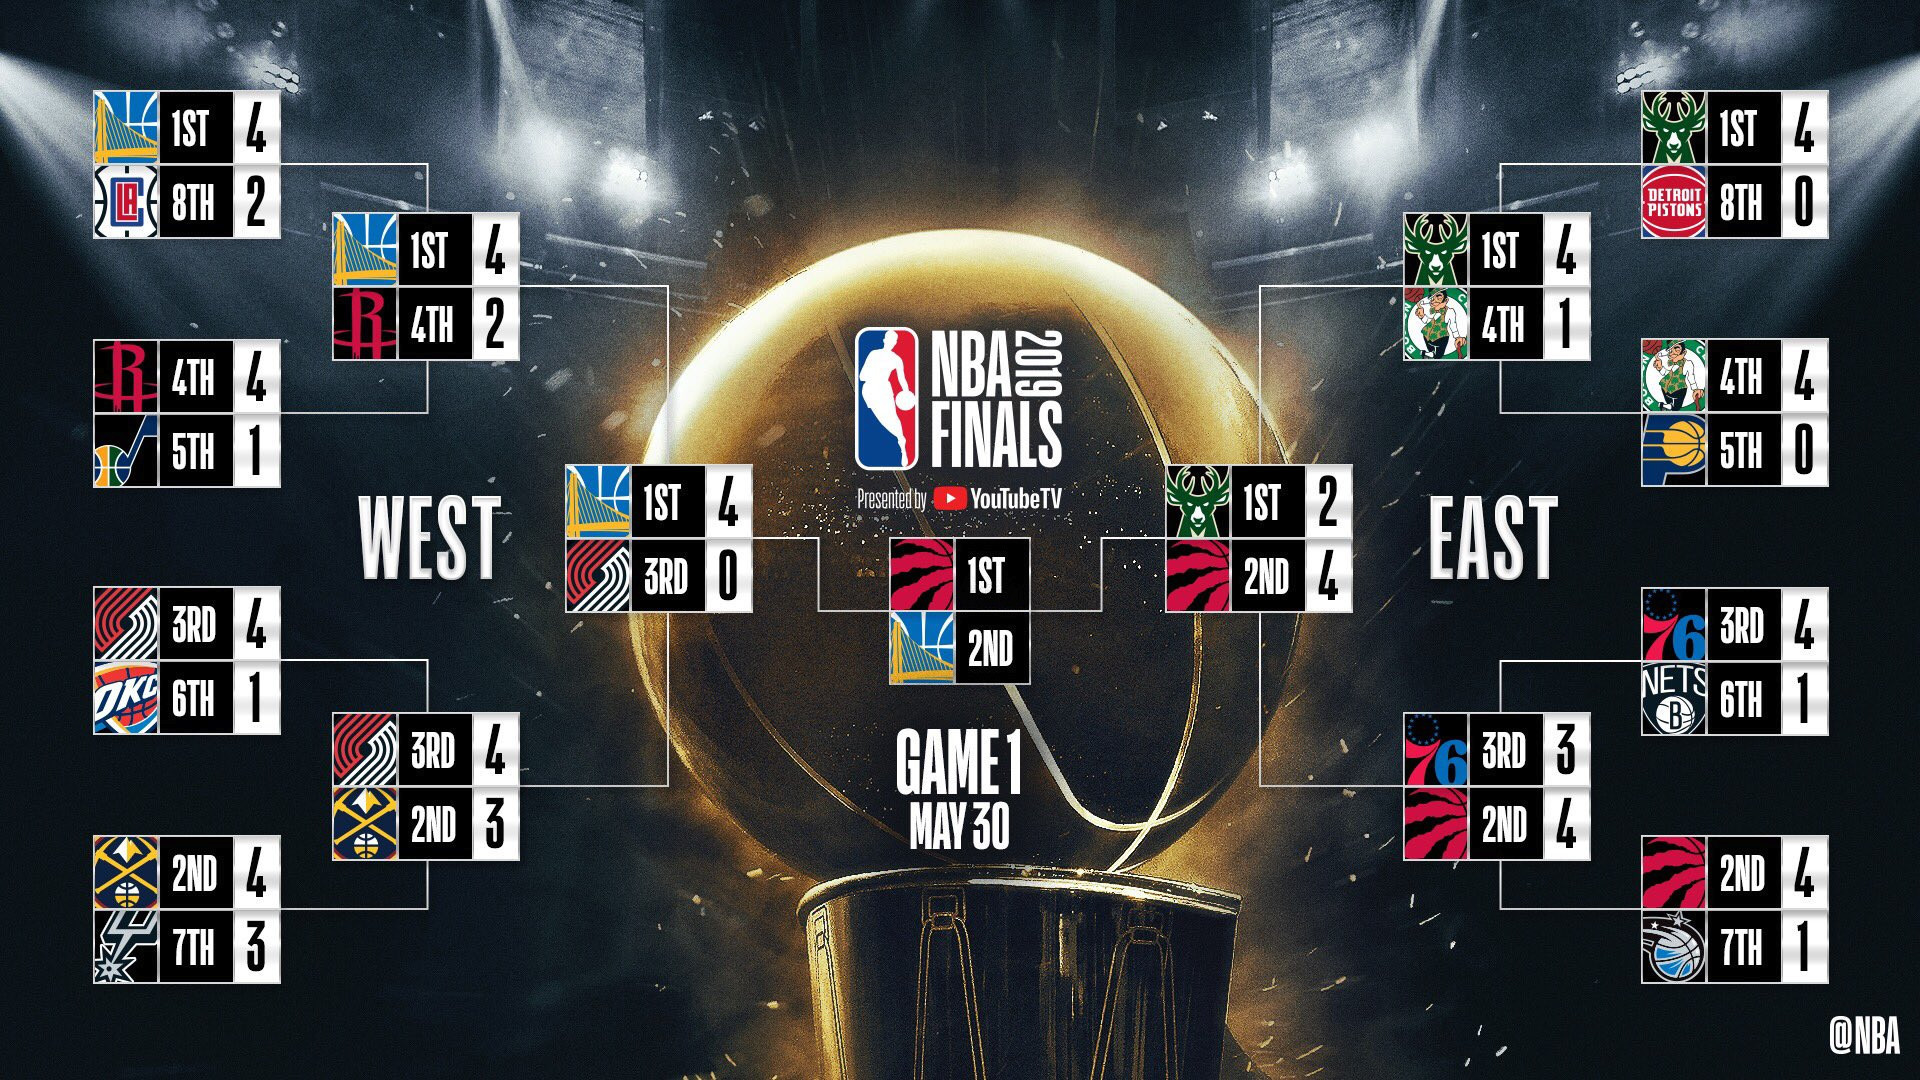 2019_NBA_bracket__fixed.jpg